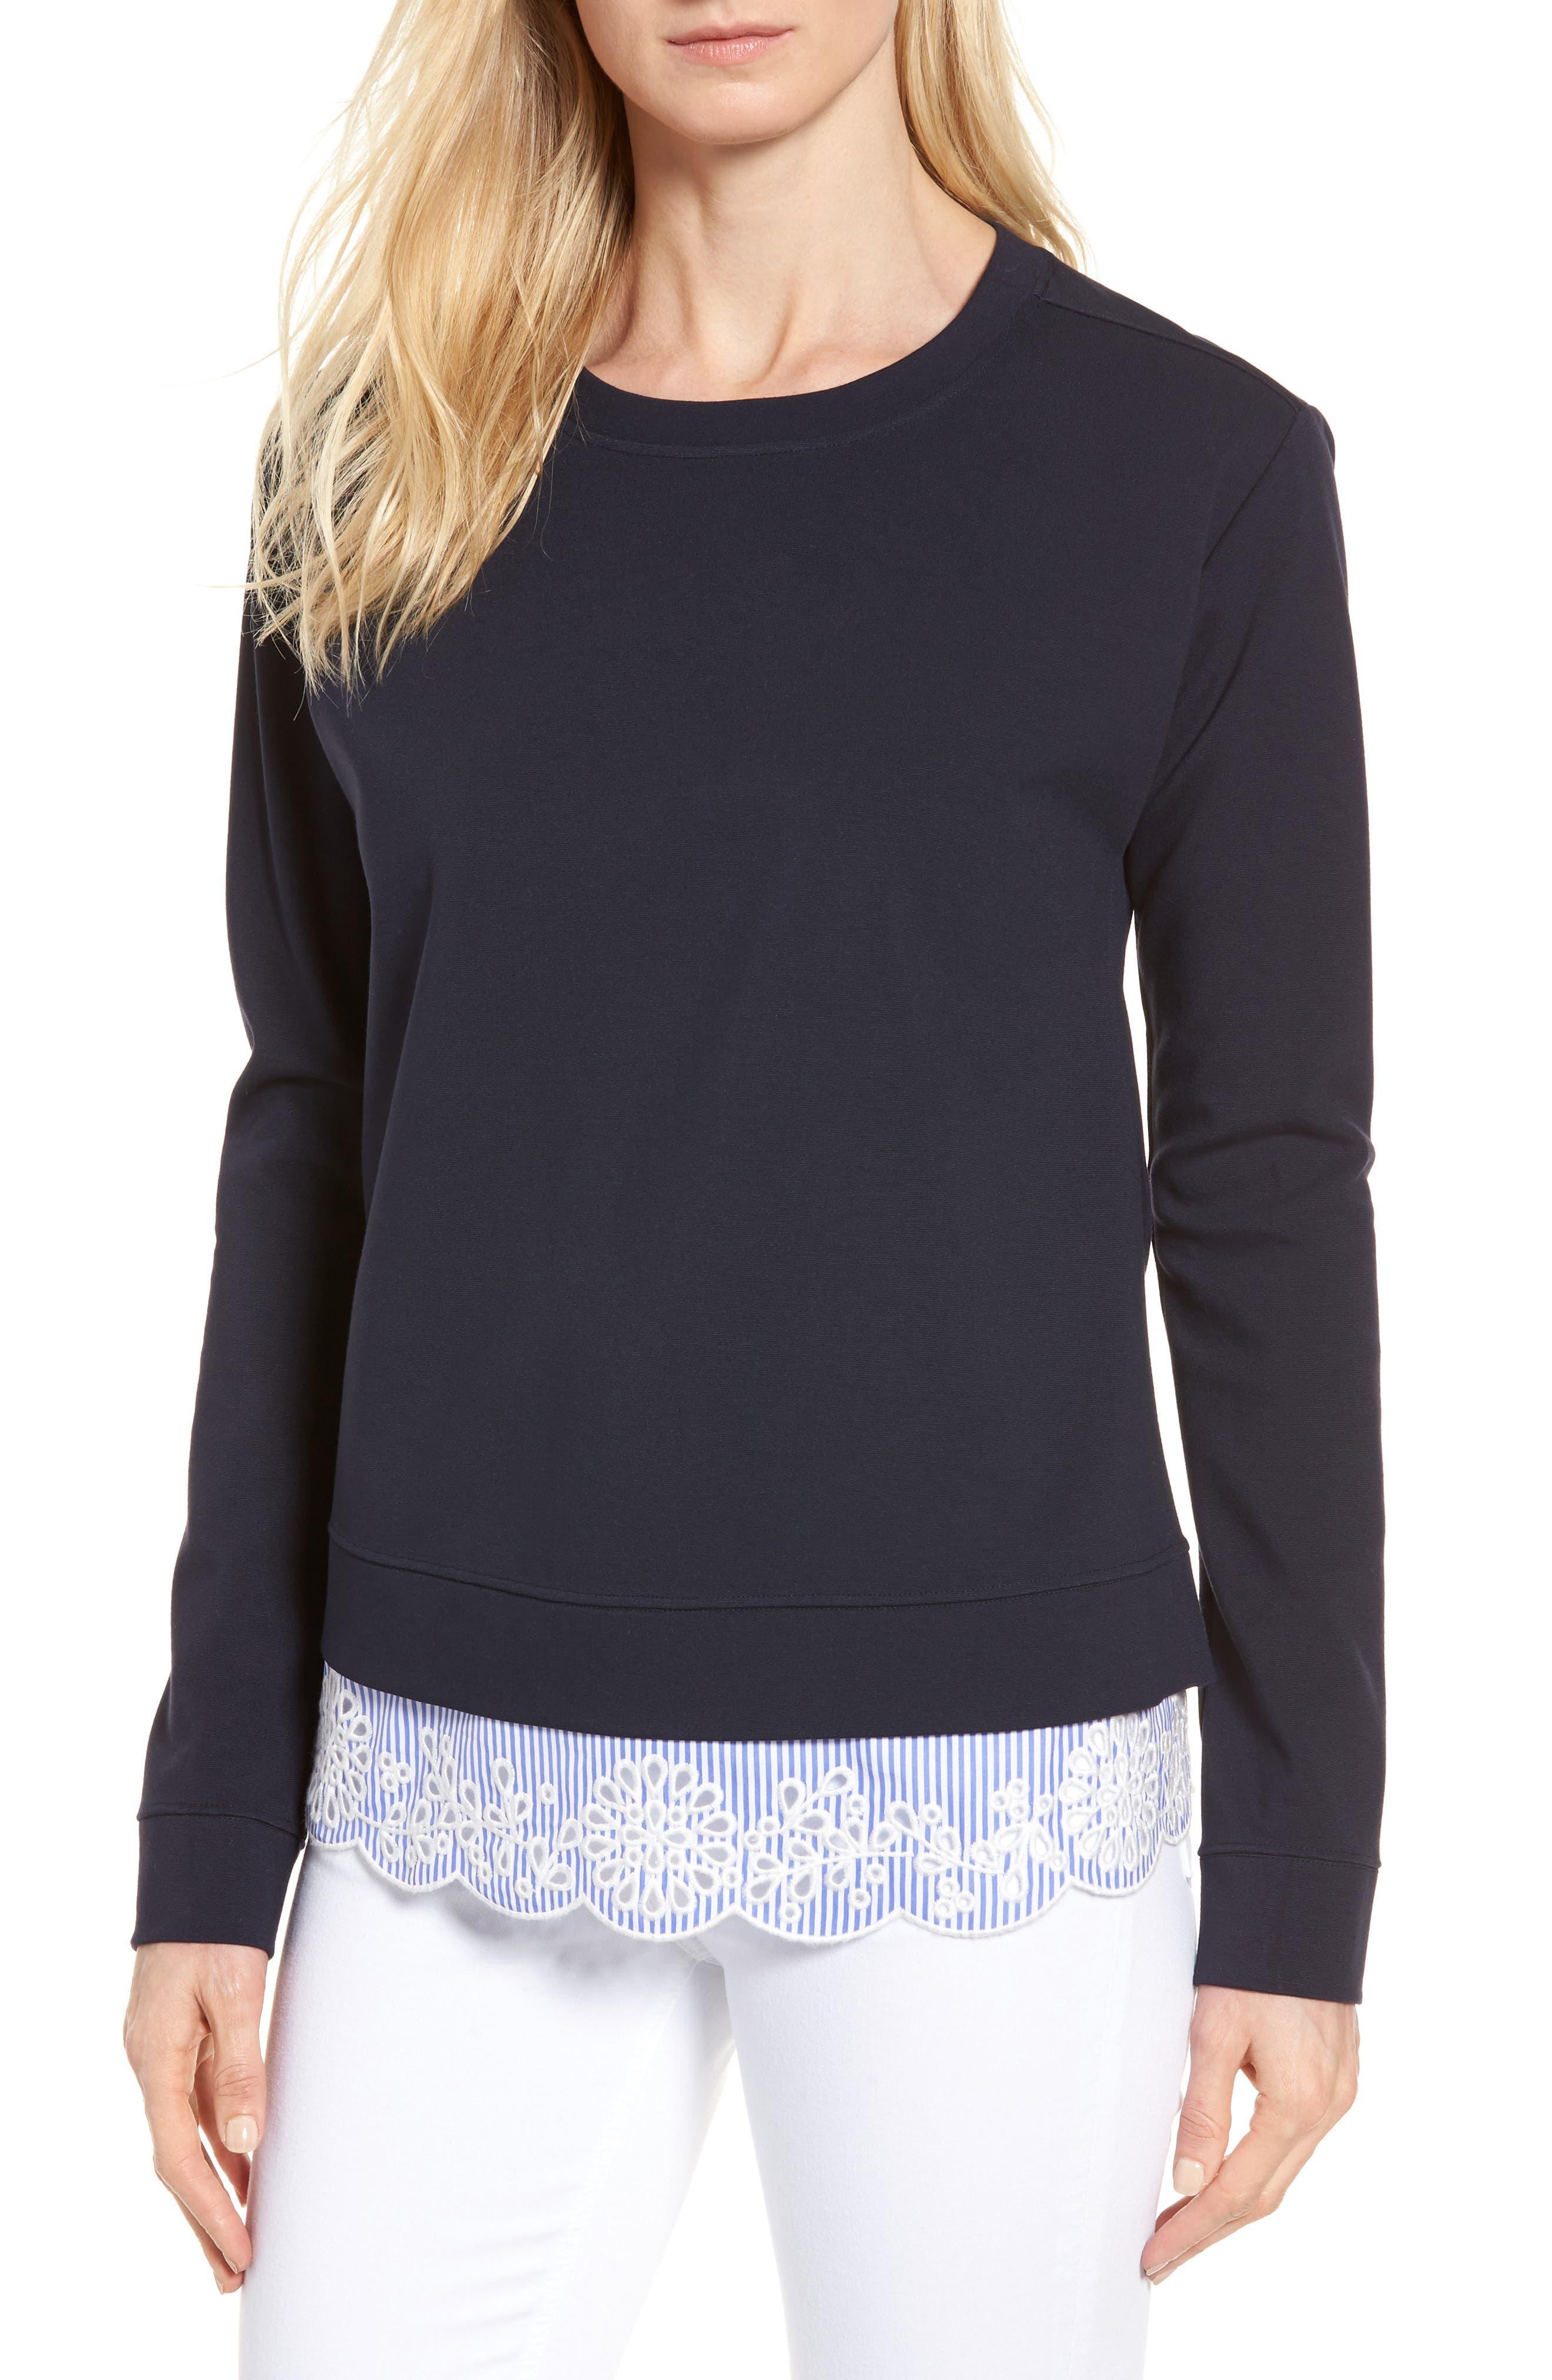 NORDSTROM SIGNATURE Woven Inset Ponte Knit Sweatshirt